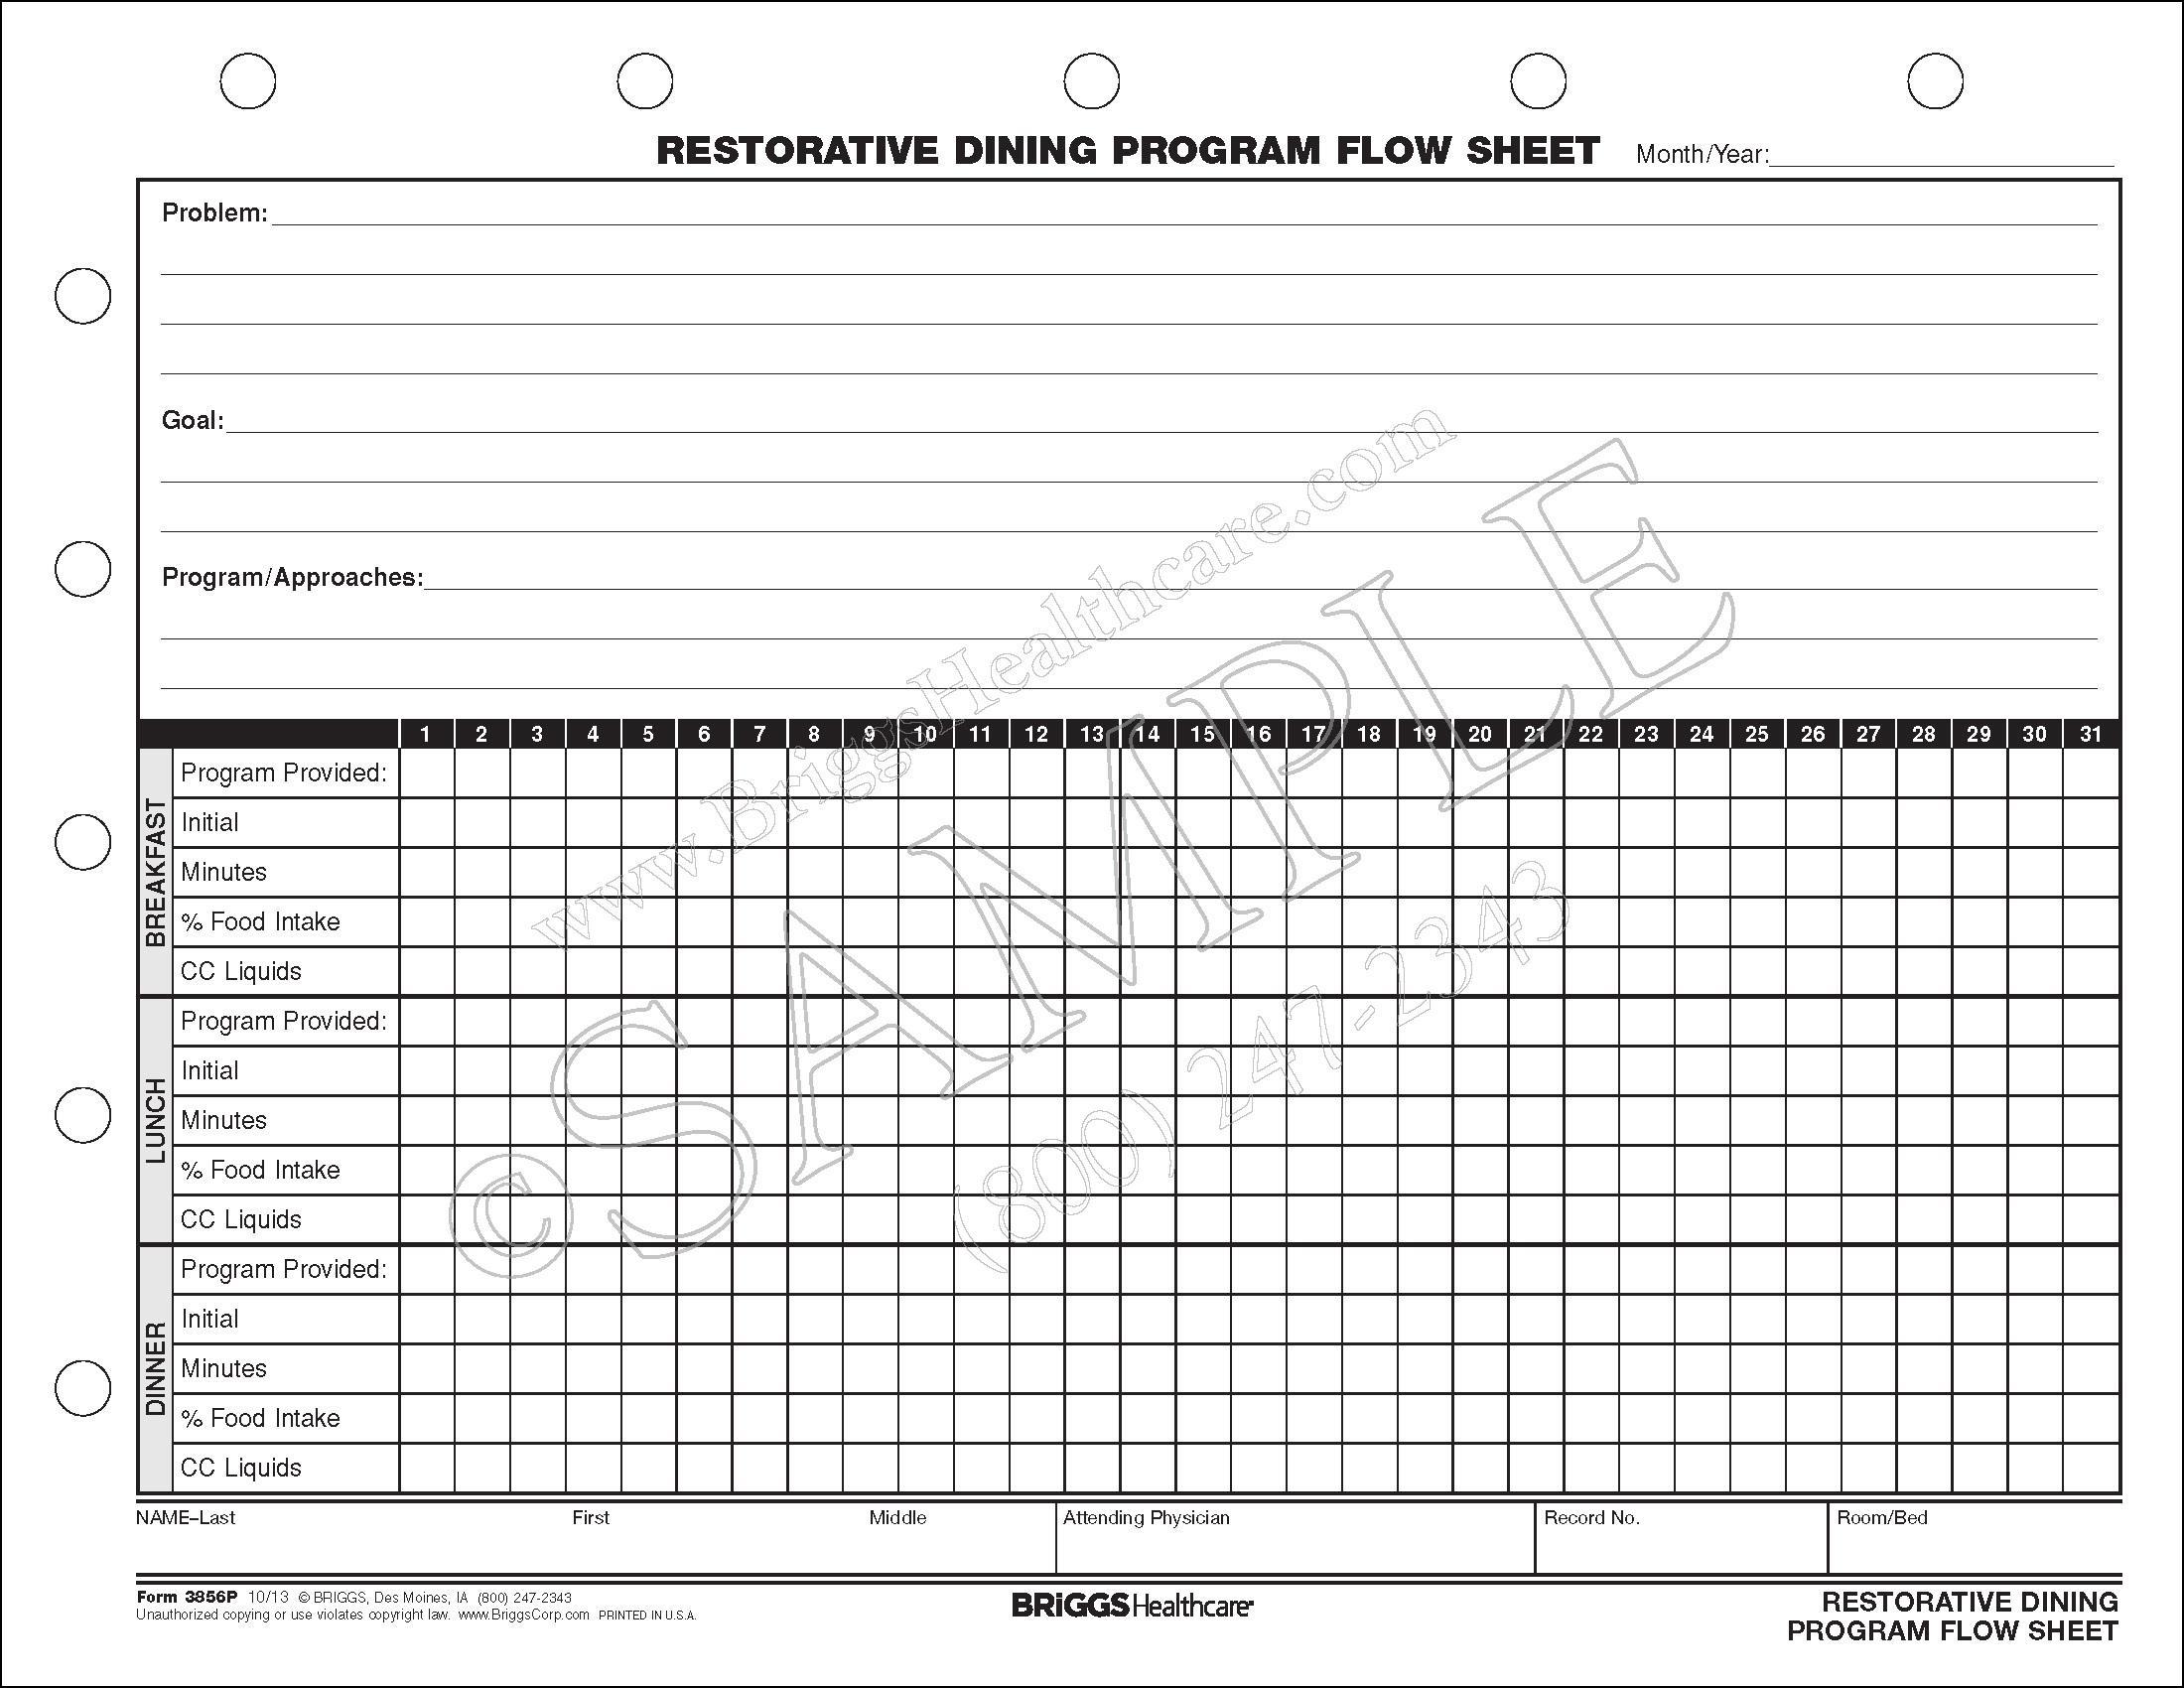 restorative dining program flow sheet